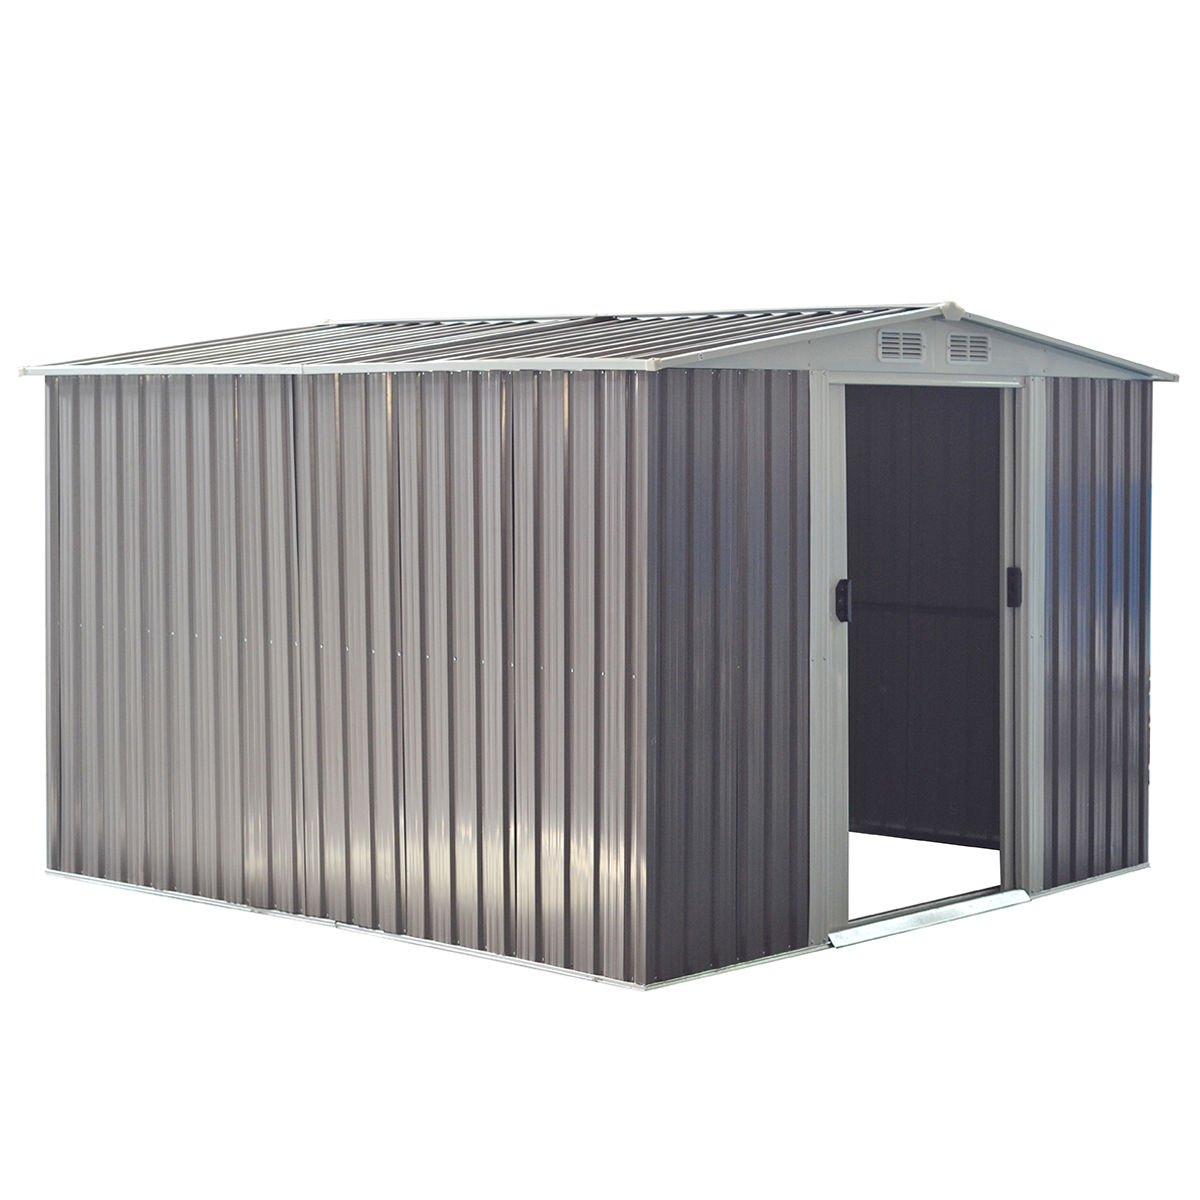 Goplus Galvanized Steel Outdoor Garden Storage Shed 8.5 x 8.5 Ft Heavy Duty Tool House W/ Sliding Door (Gray)